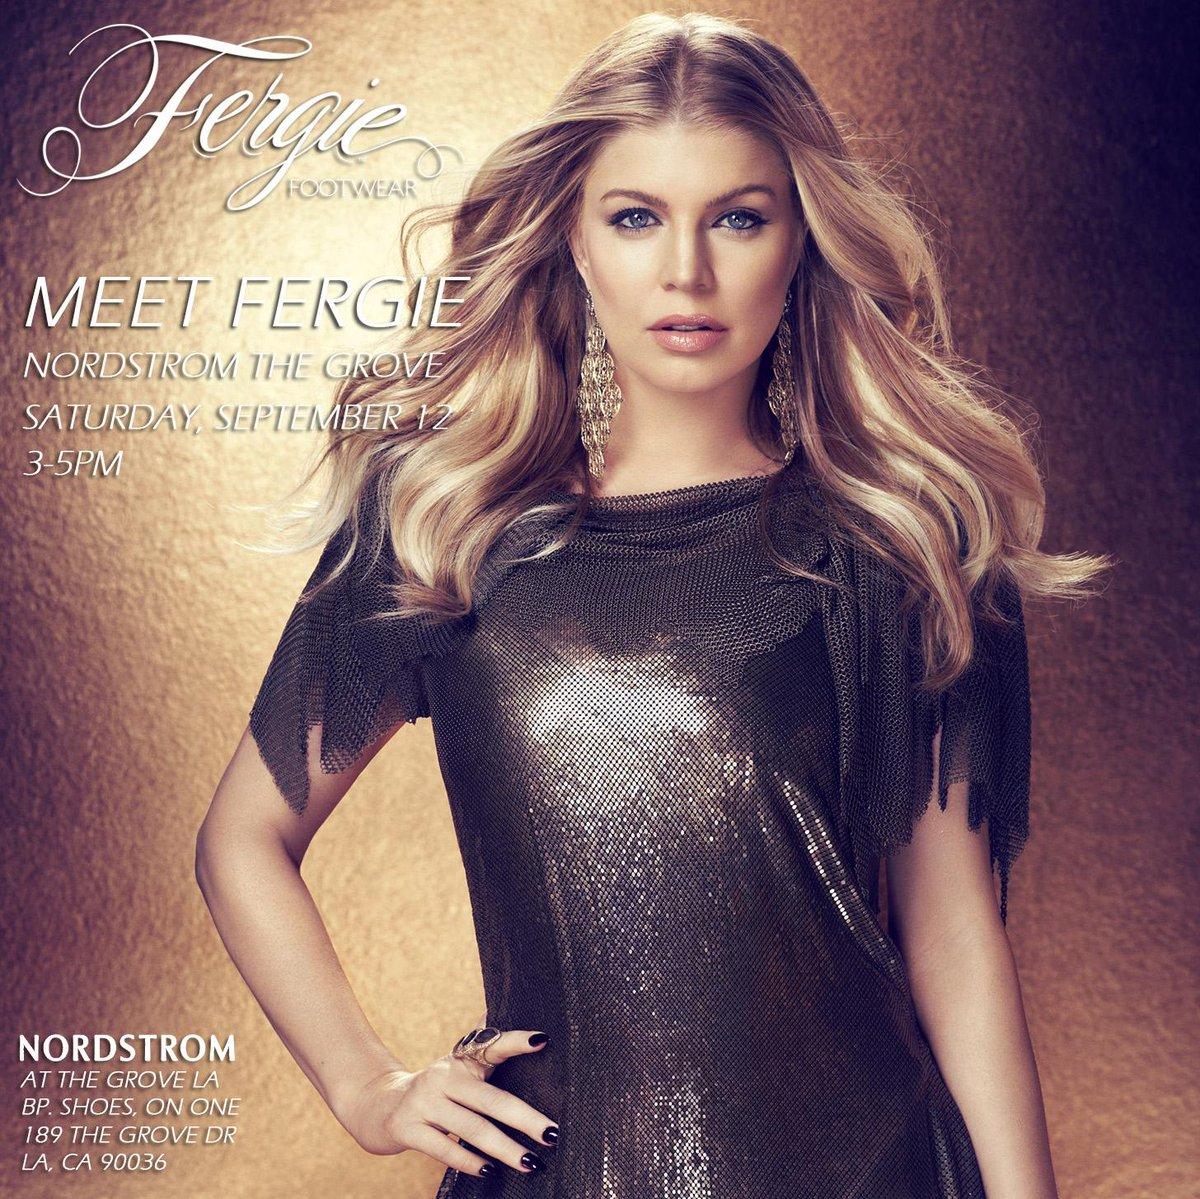 RT @FergieFootwear: TMRW 9/12,w/ yr #FergieFootwear purchase,MEET @FERGIE 3-5pm at @Nordstrom @TheGroveLA! #RSVP http://t.co/XxPX1CPHS0 htt…